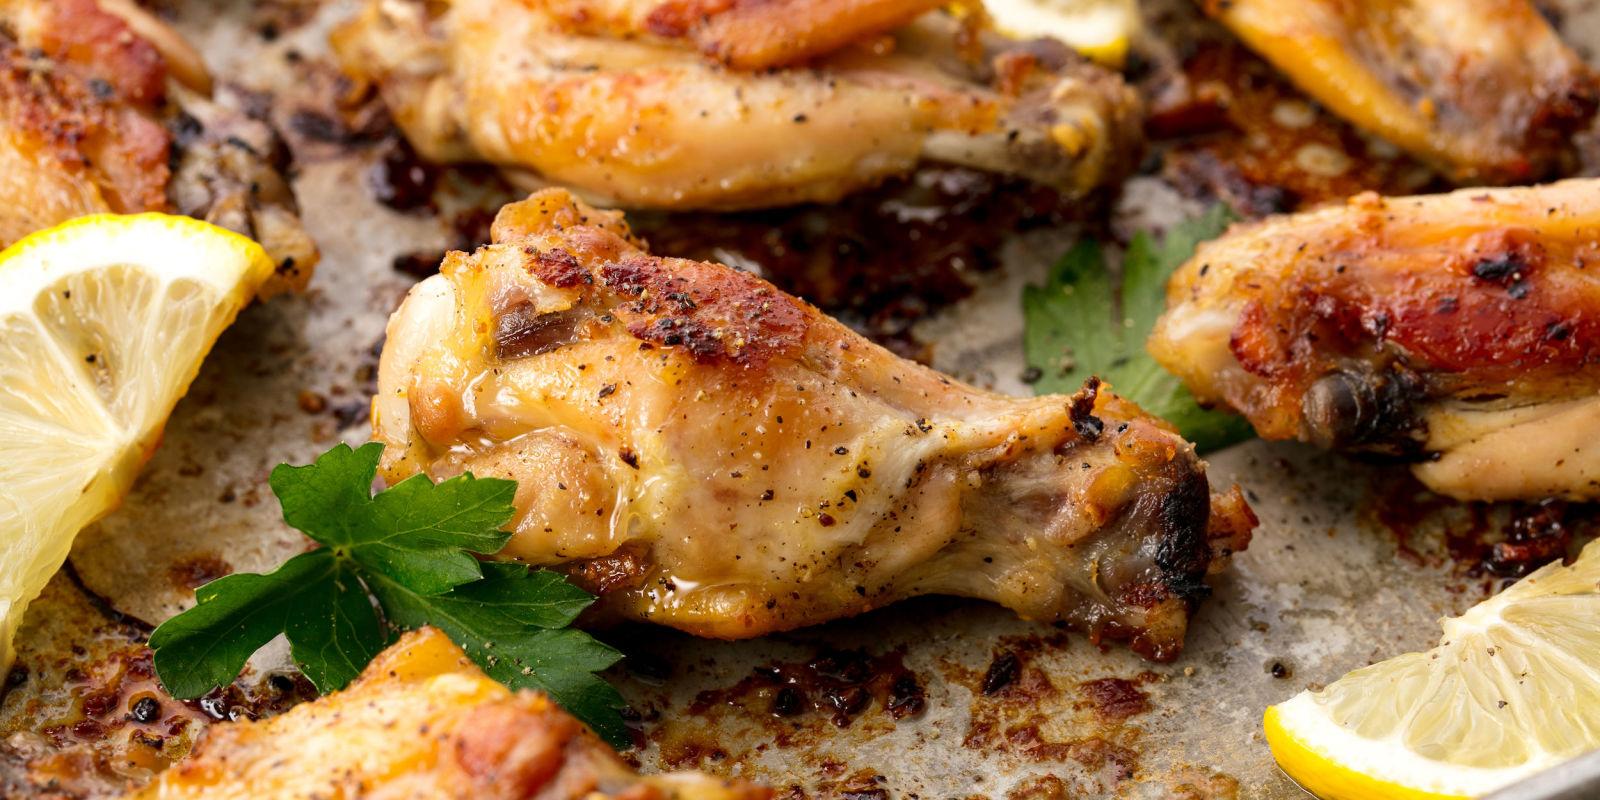 lemon pepper chicken wings - photo #27